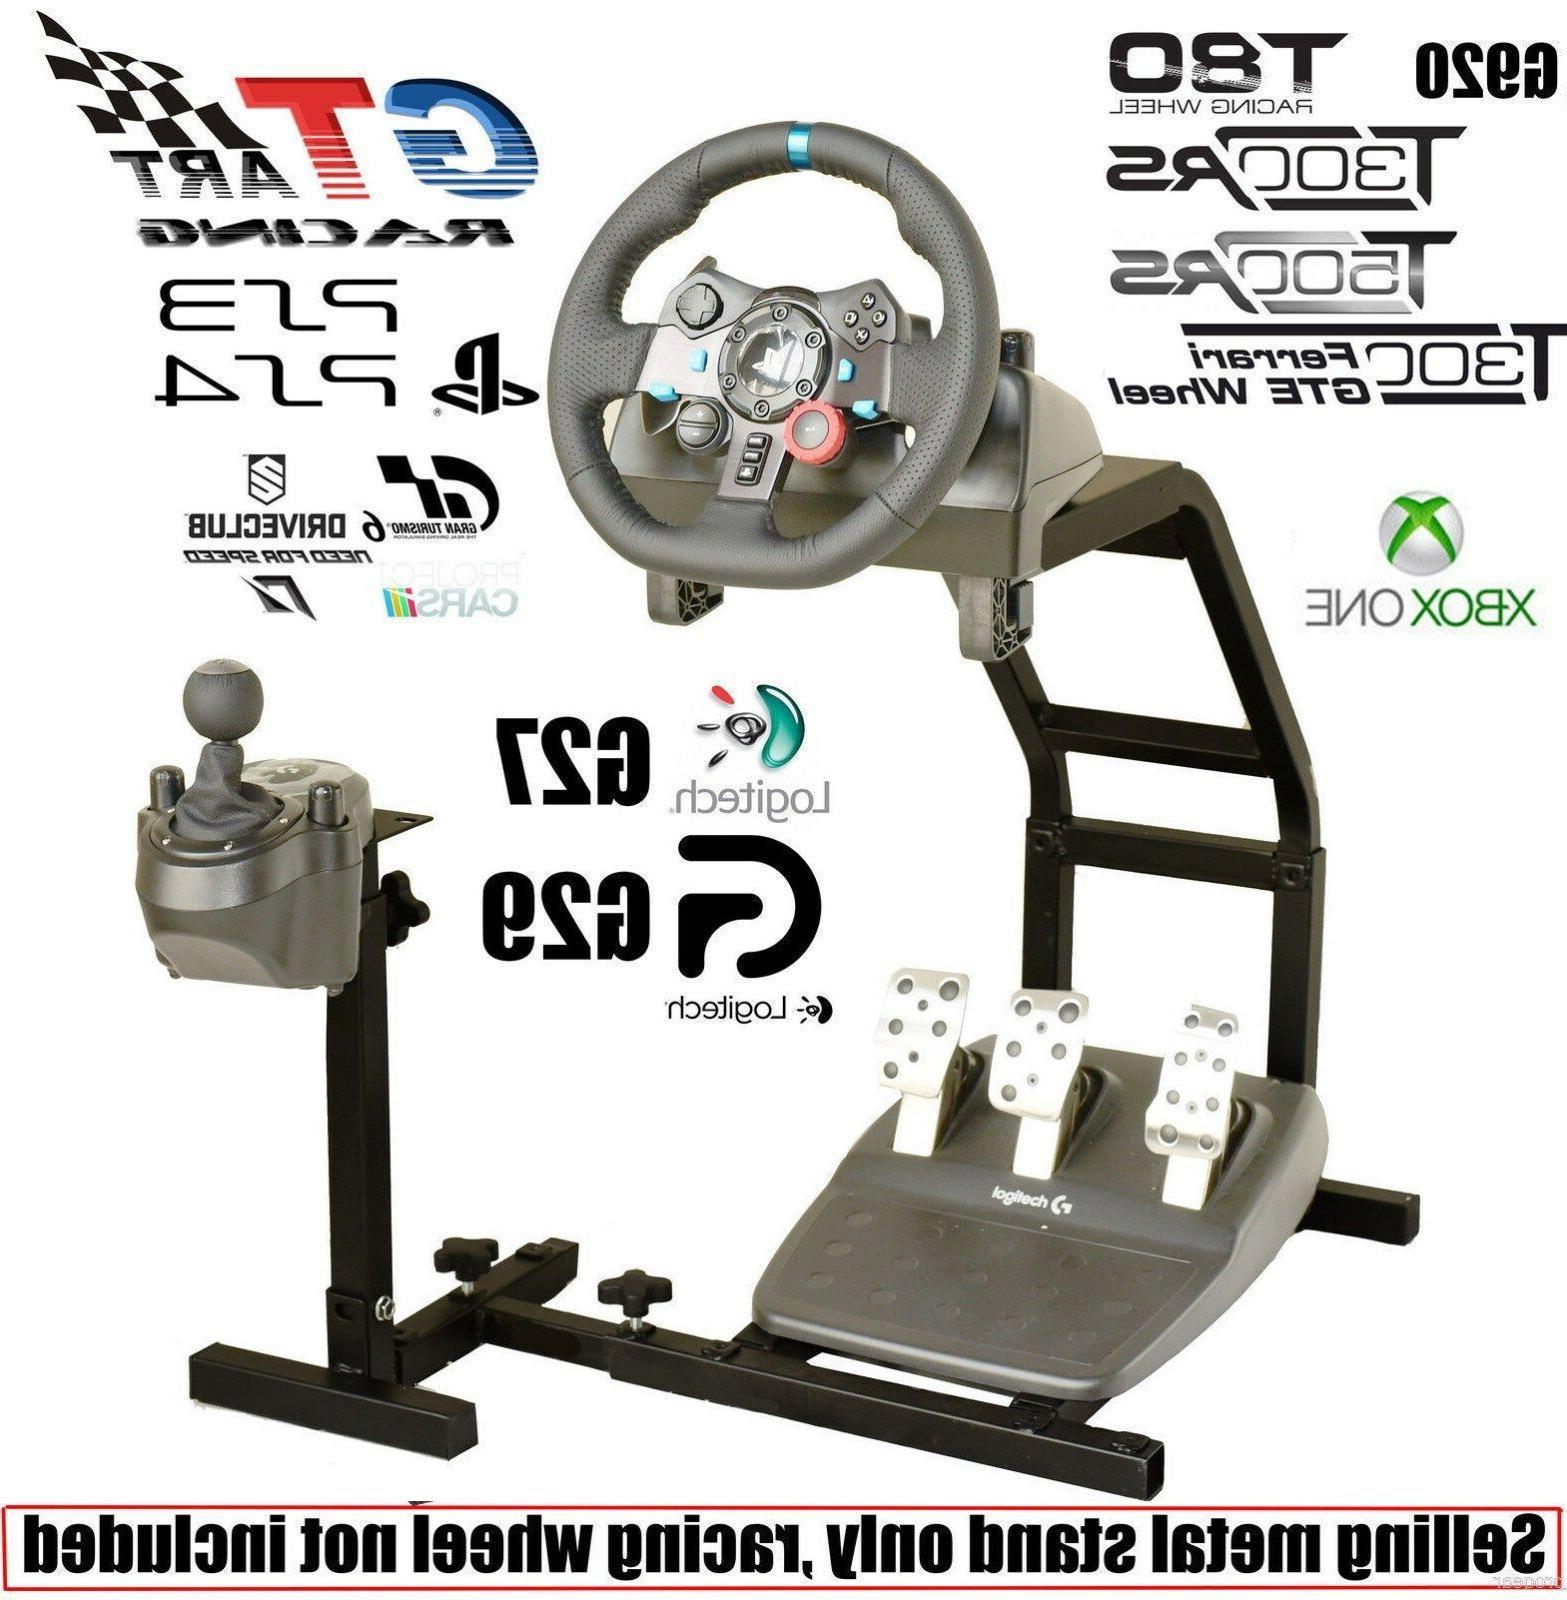 MINI ARTRacing Simulator Steering Wheel for Logitech G27 XBOX